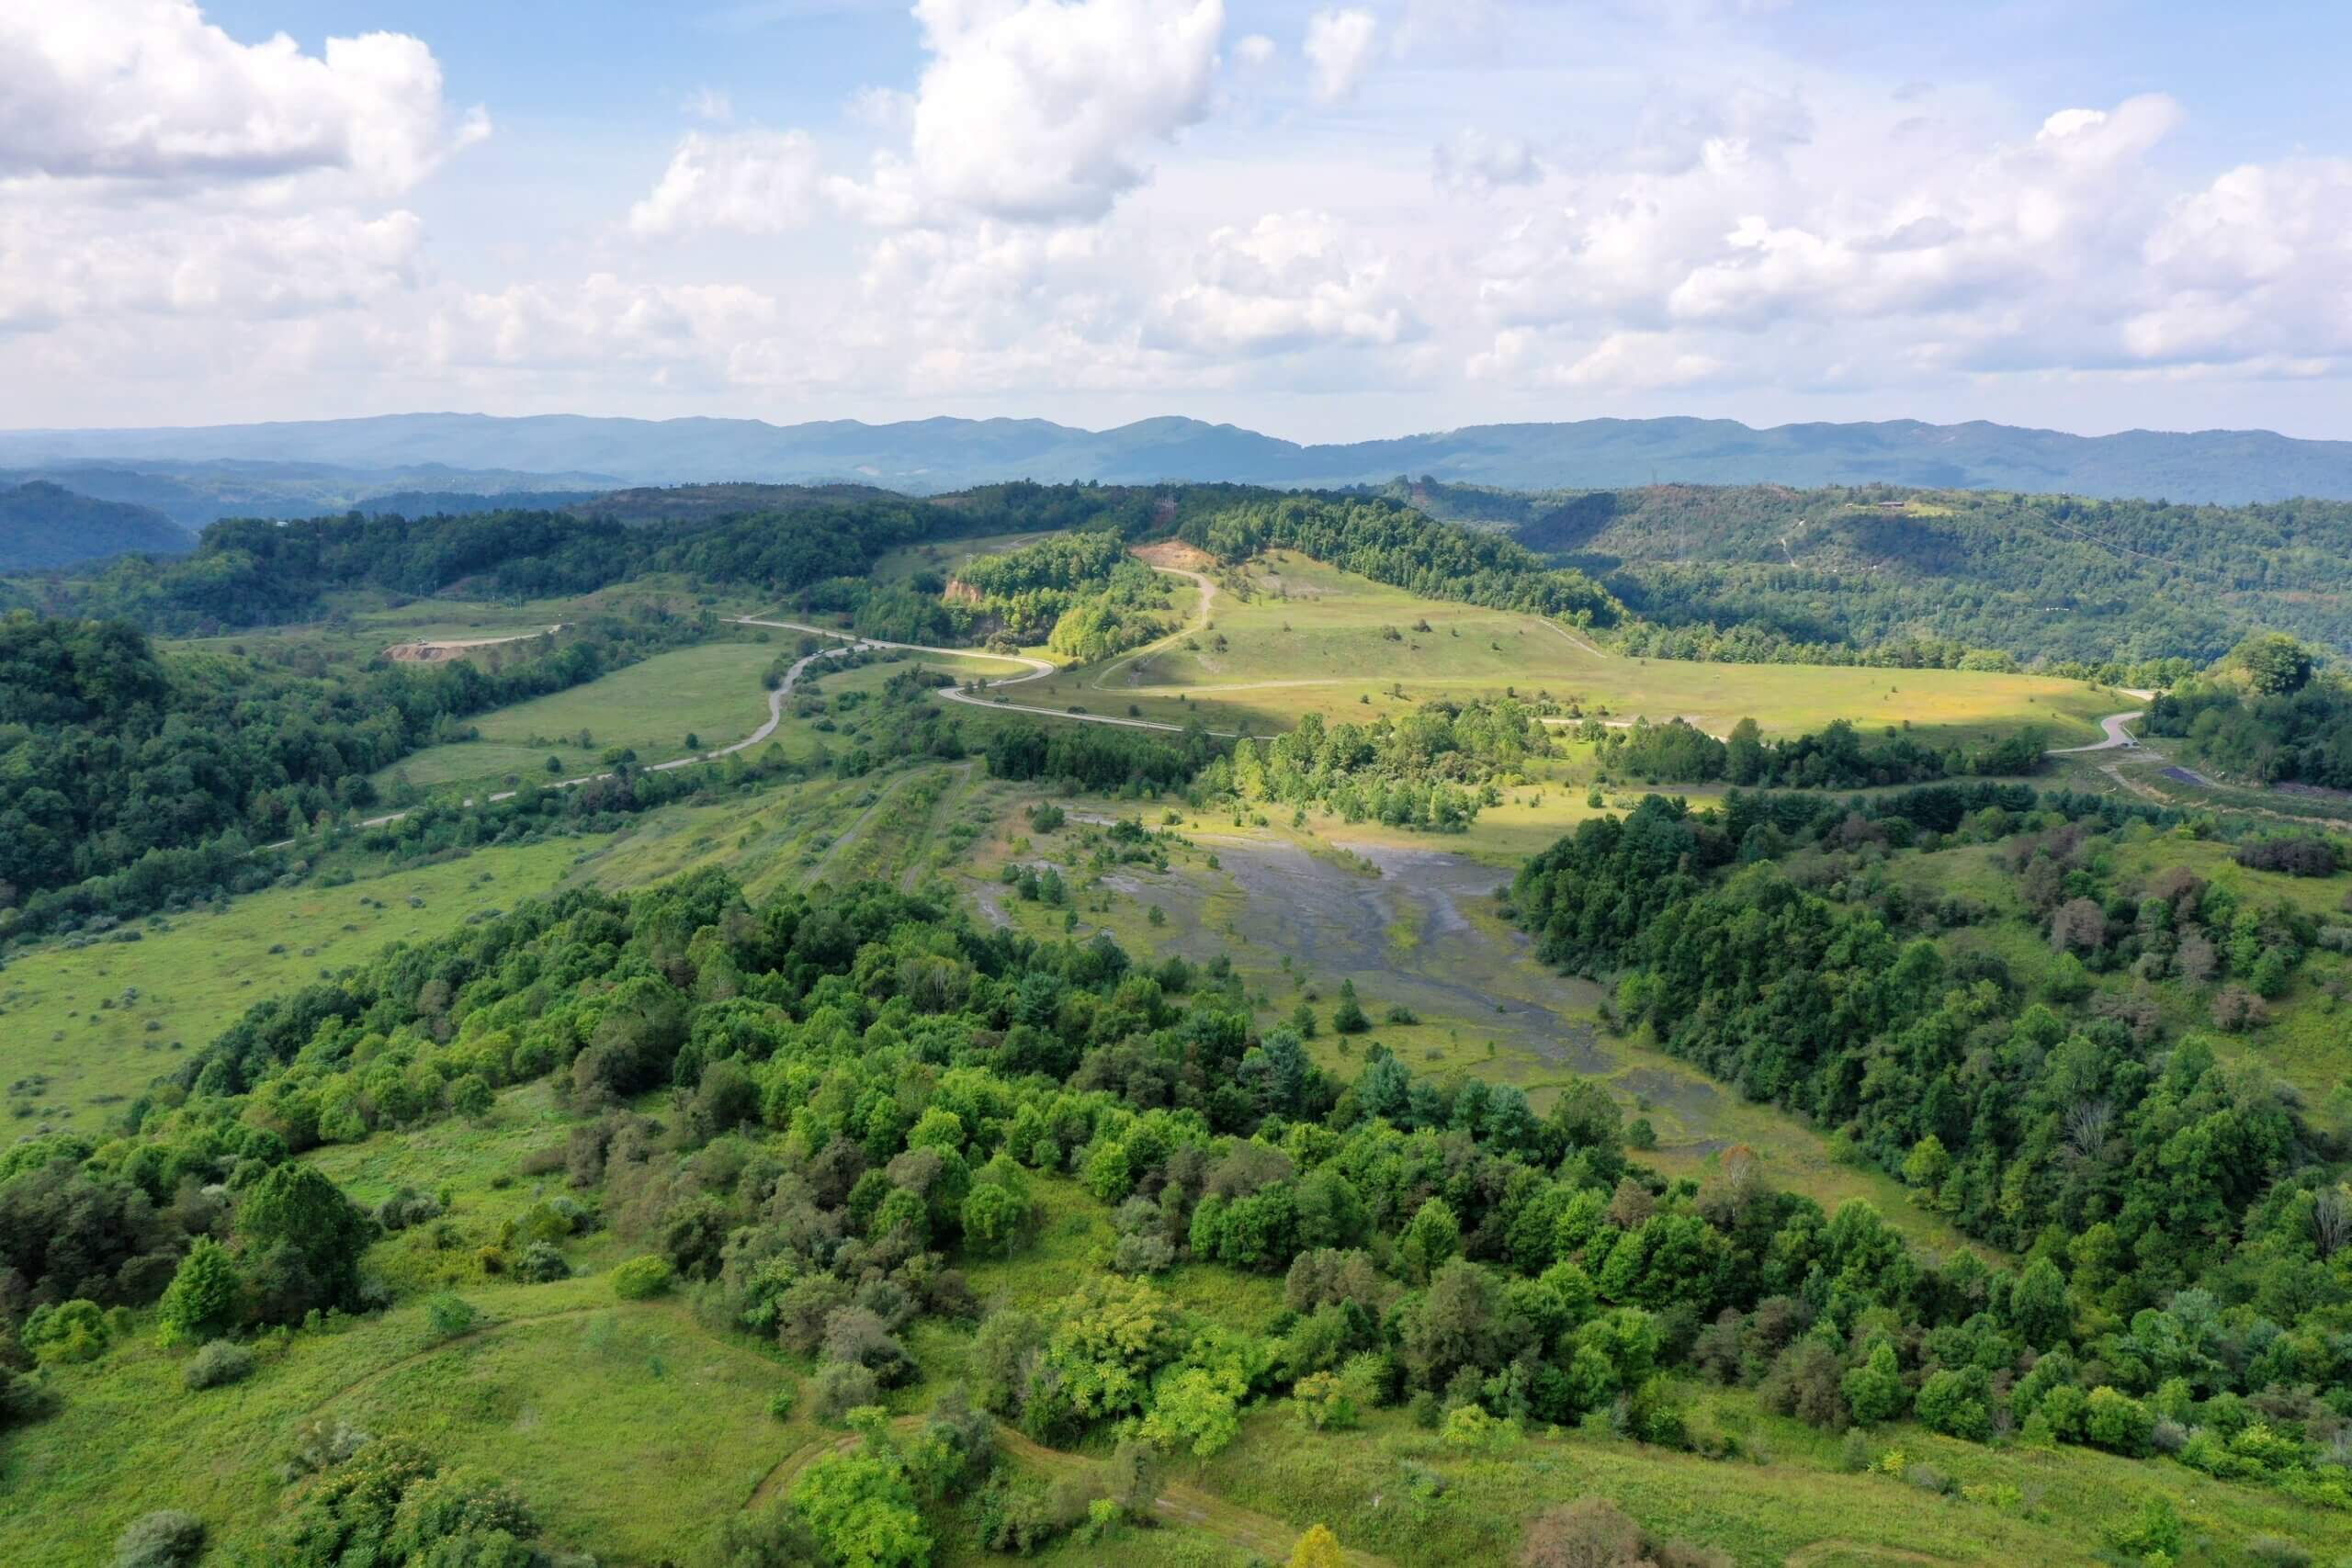 The Nature Conservancy, Dominion Energy collaborate on solar development